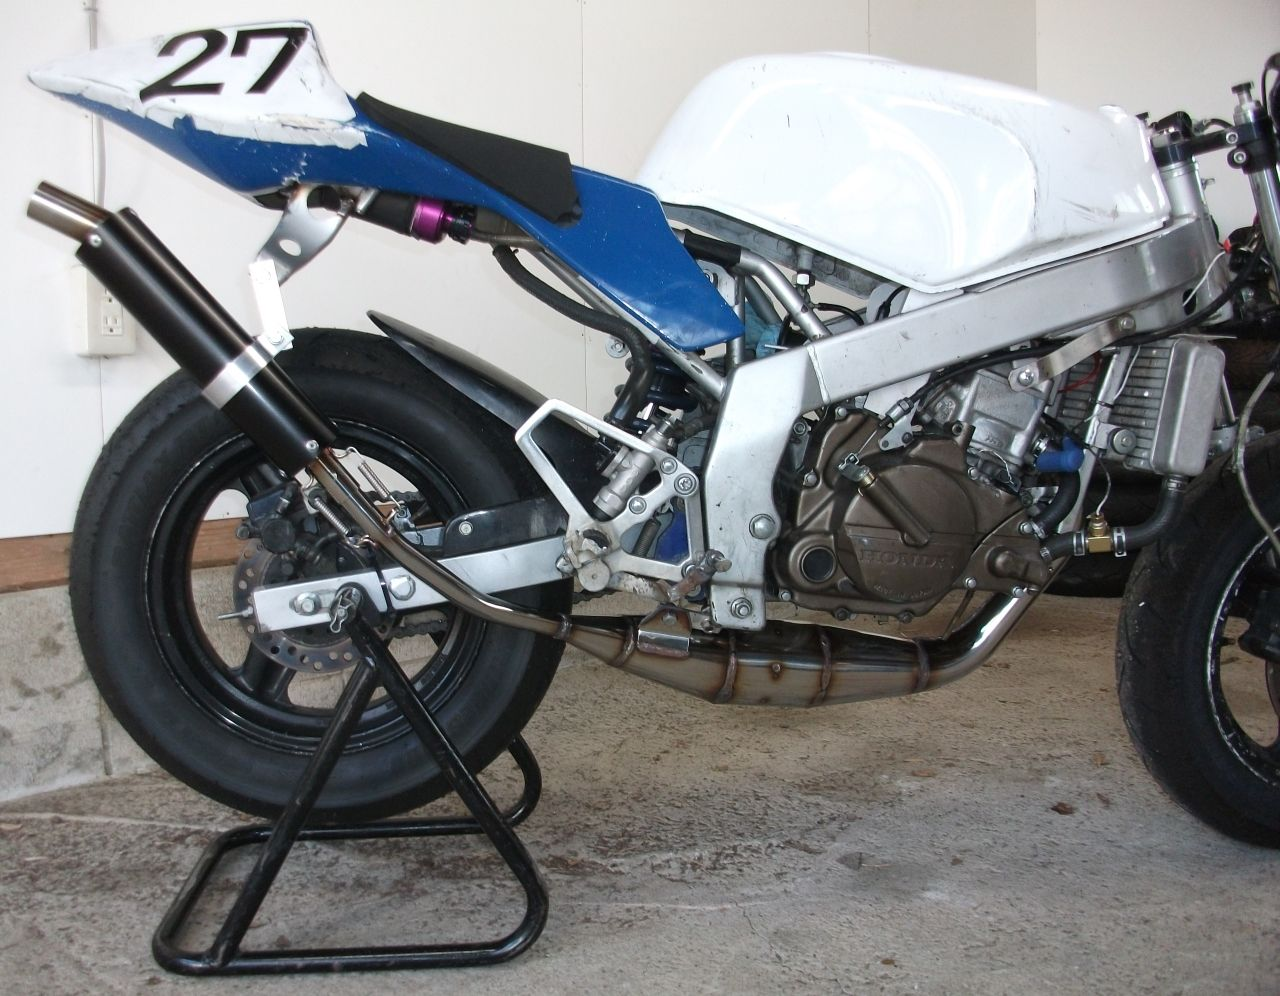 【Racing Shop Yokota】TZM50R 街頭賽車俱樂部 不銹鋼 hand-rolled 膨脹室排氣管